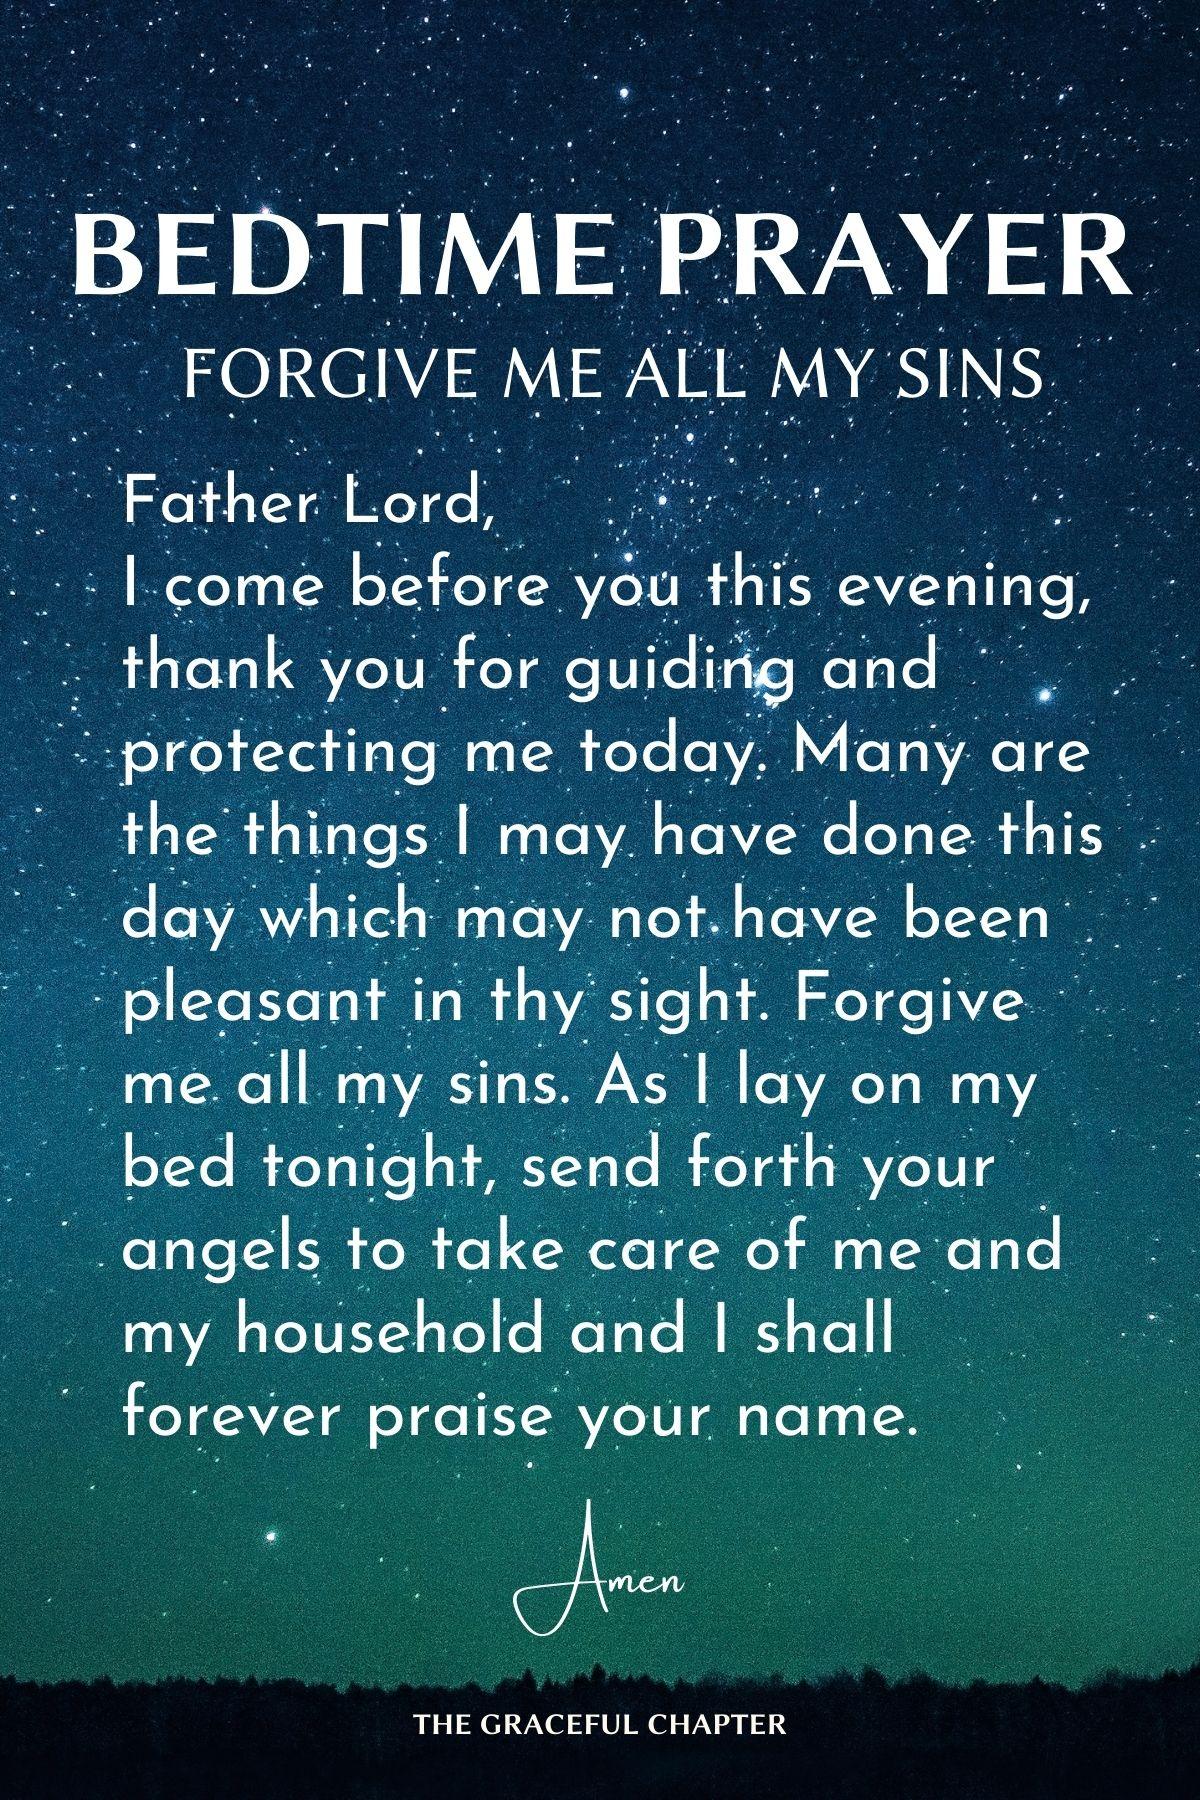 Forgive me all my sins